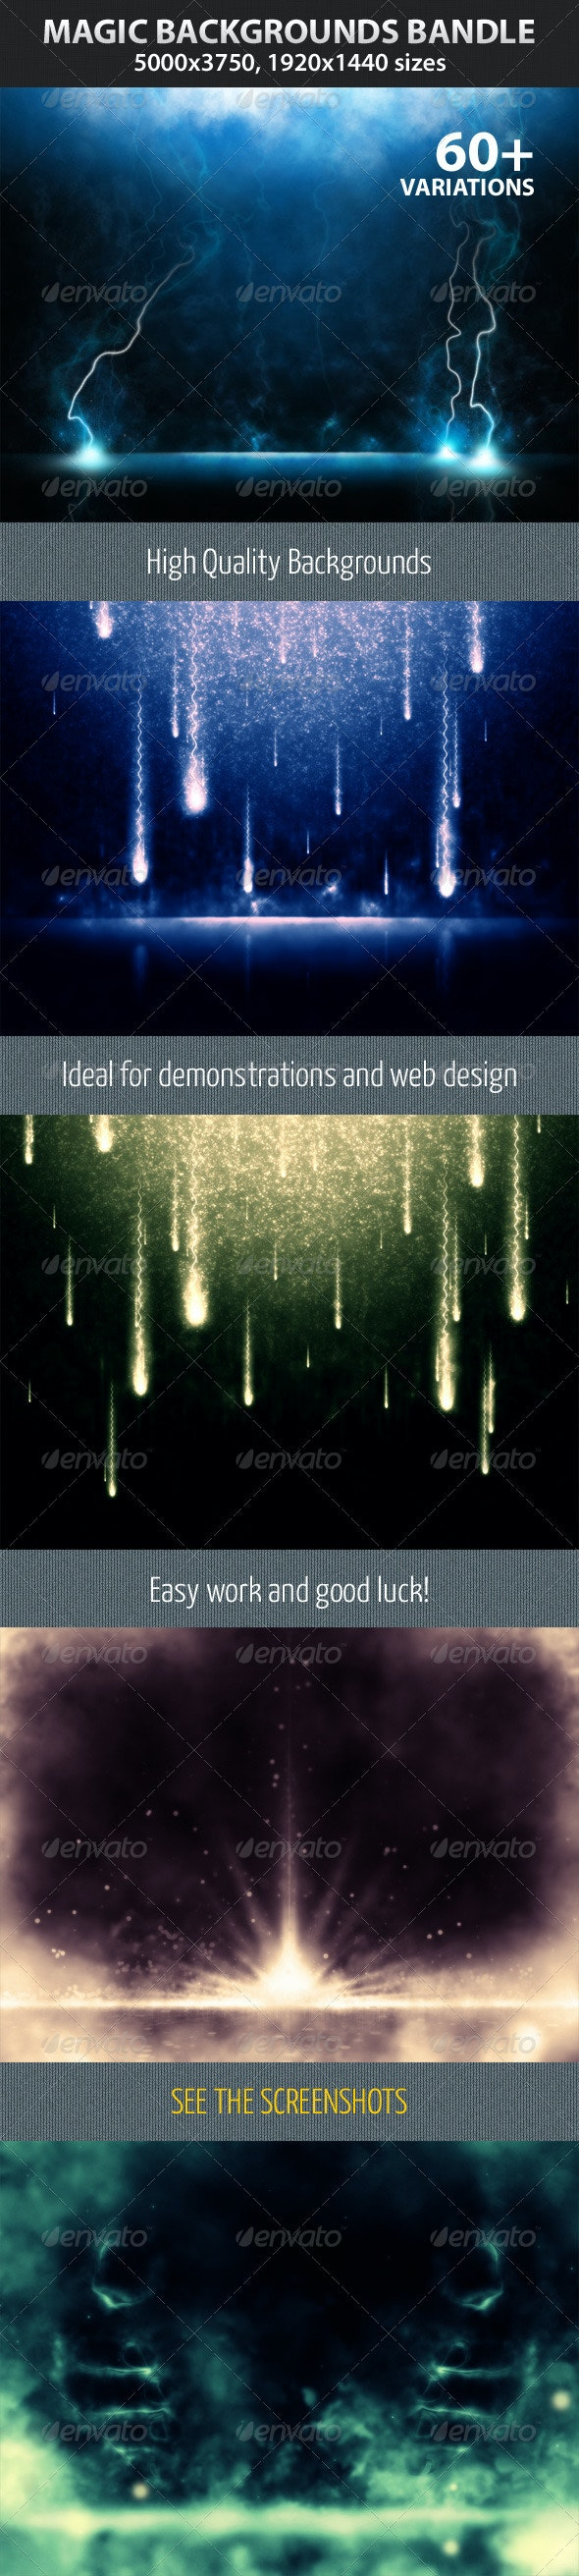 Magic Backgrounds Bandle - Backgrounds Graphics